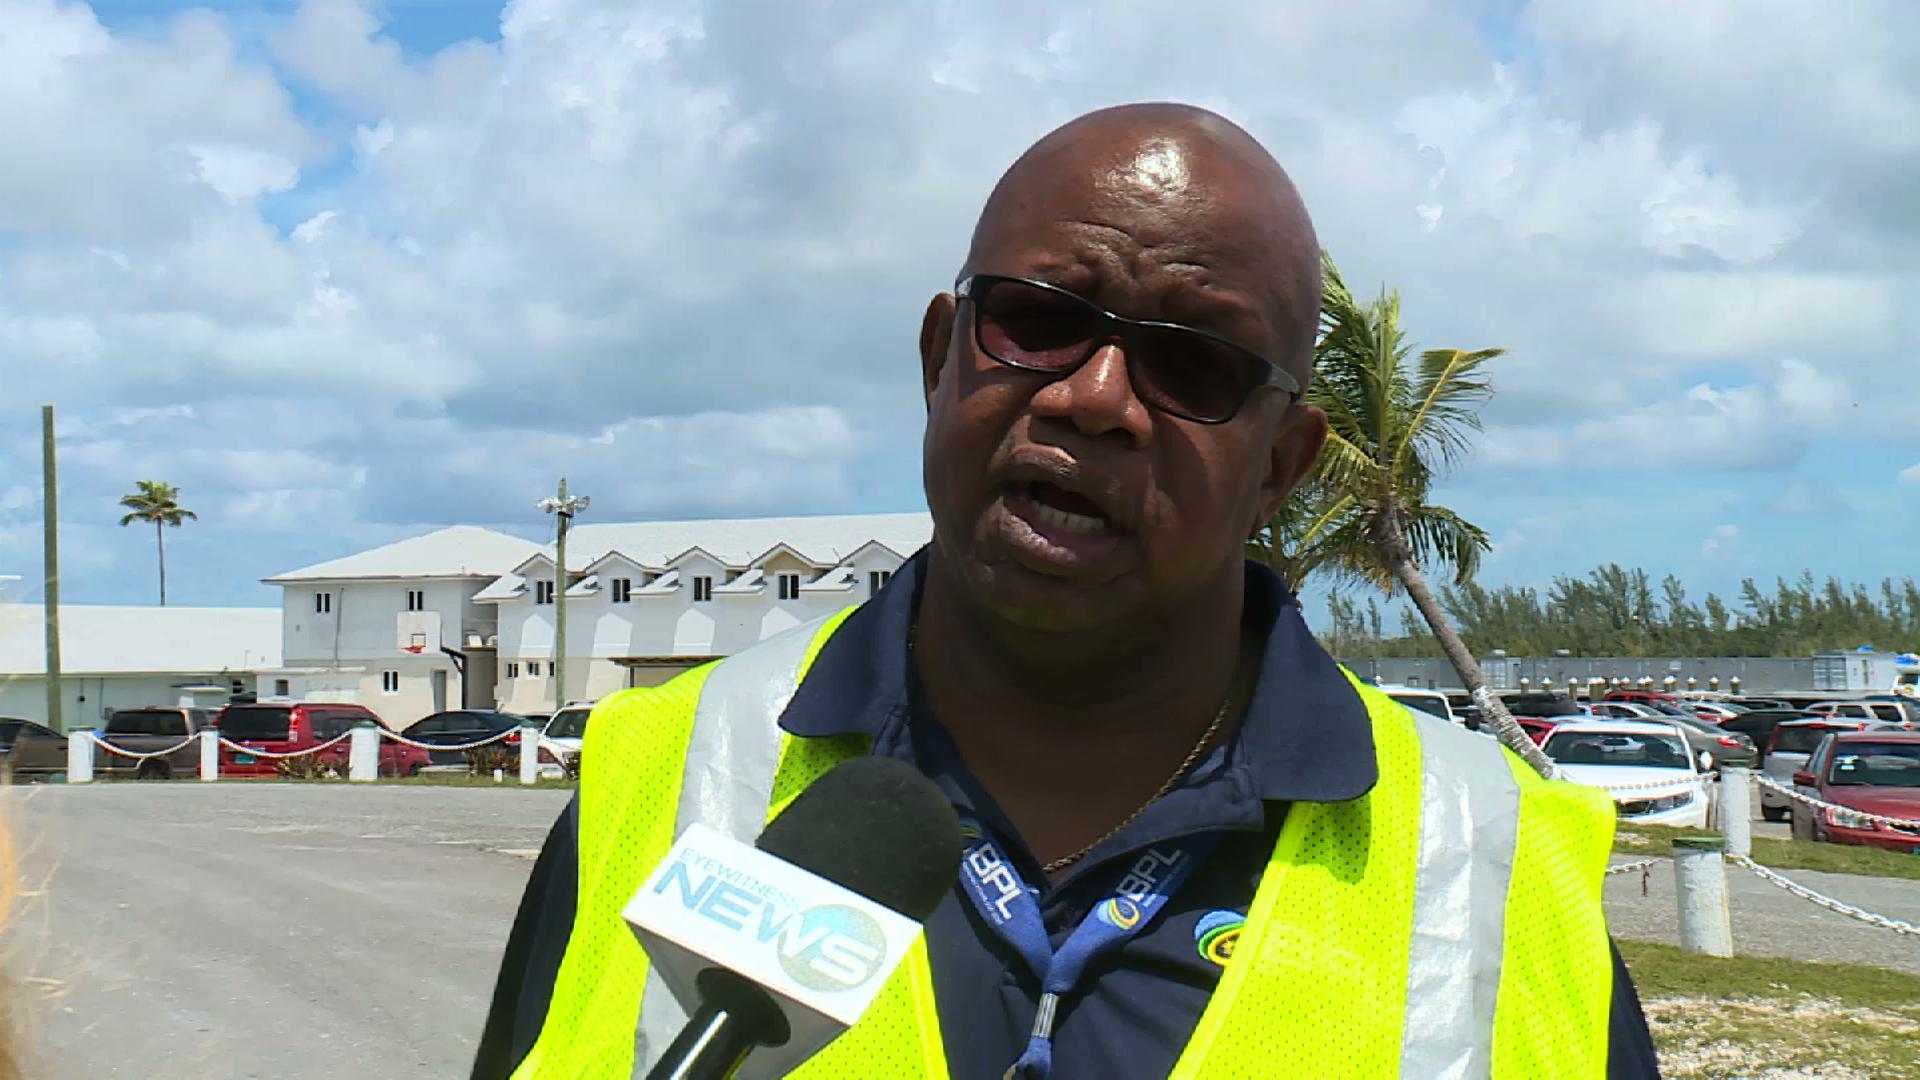 BPL union head predicts load shedding until Christmas